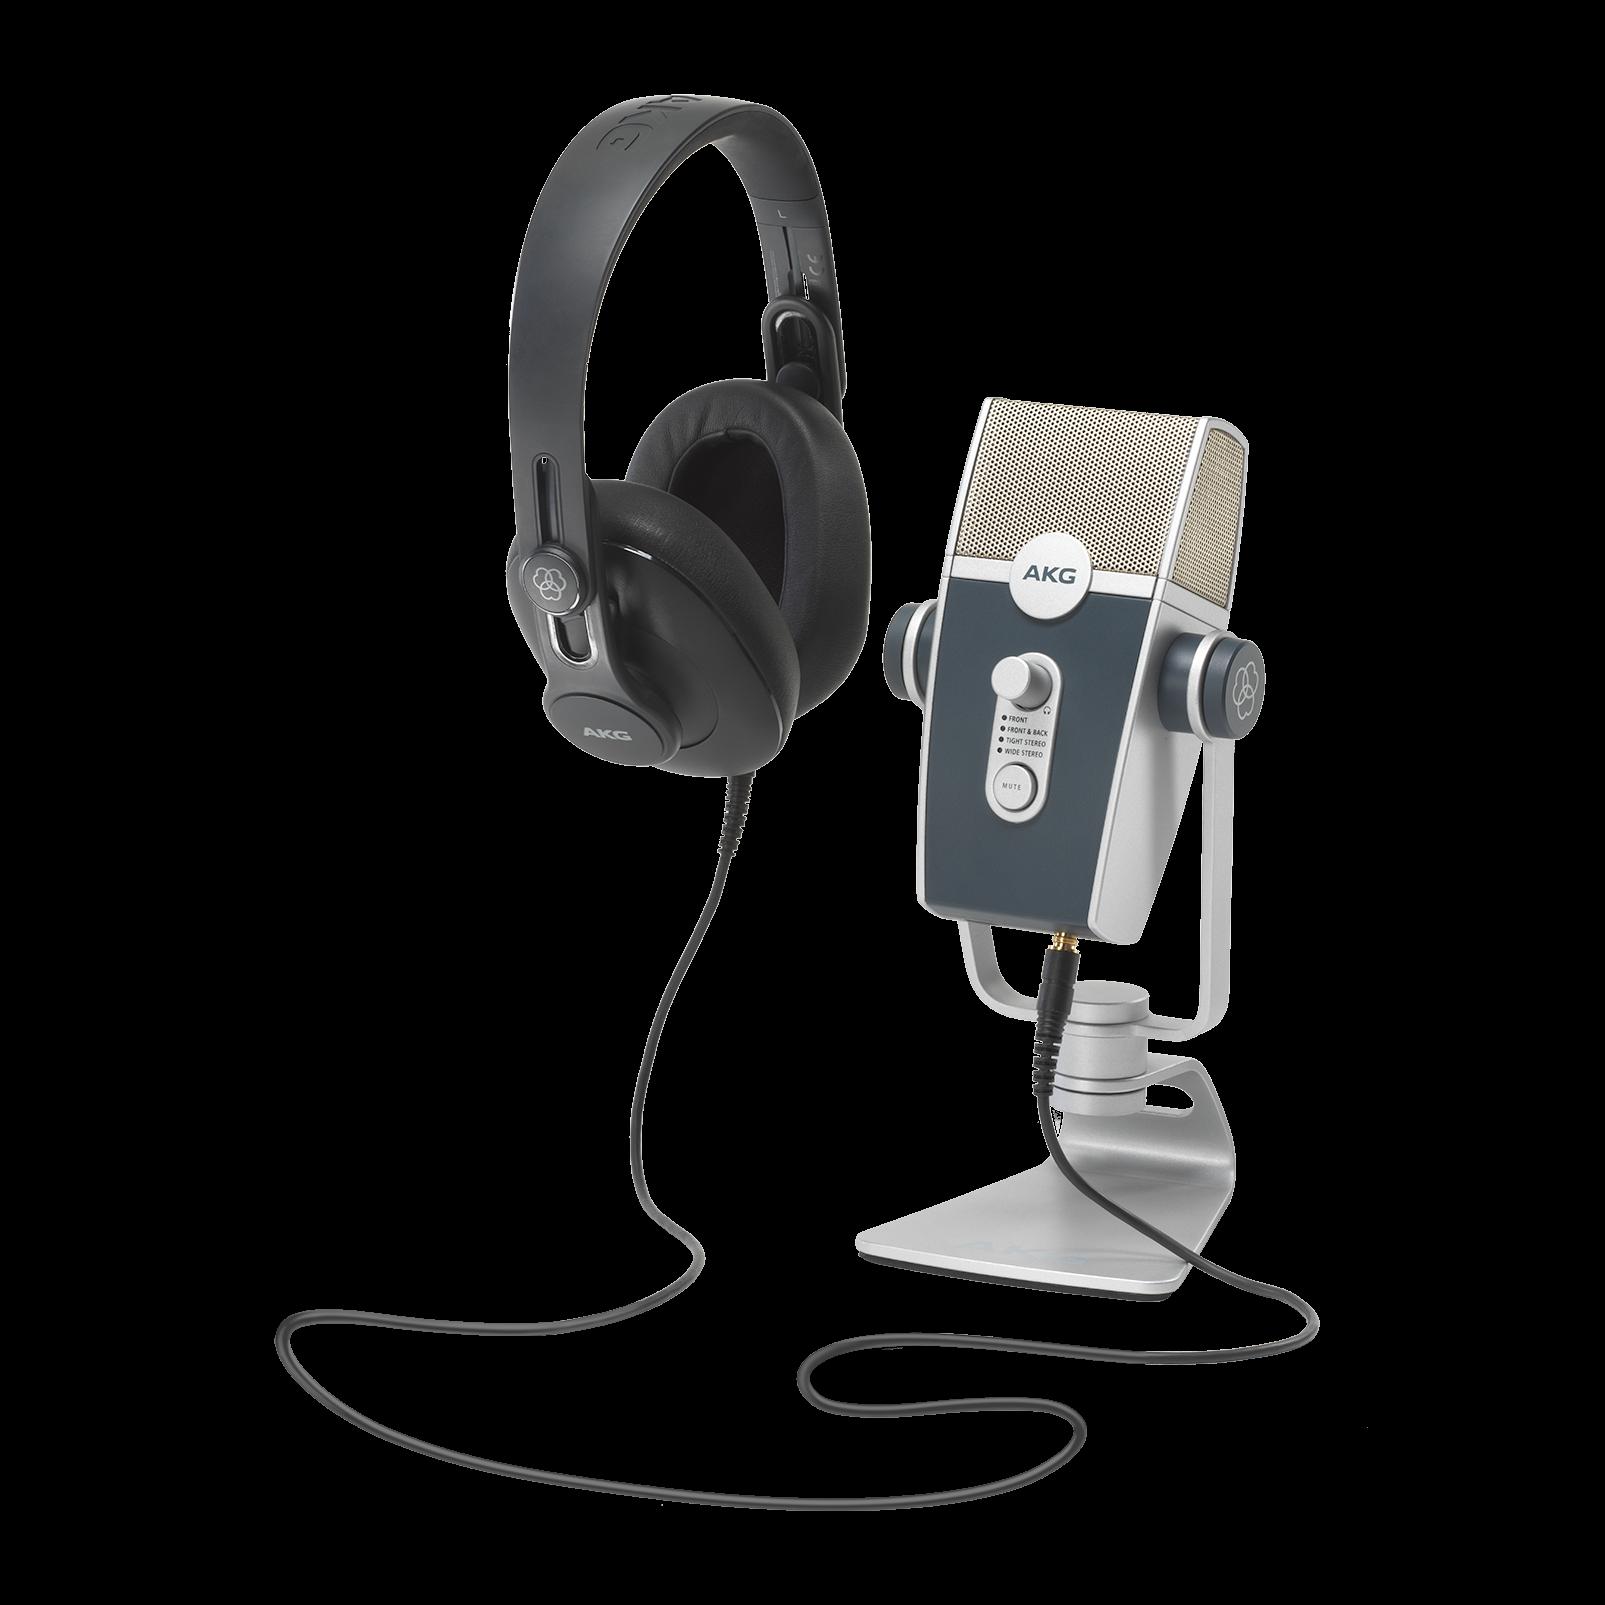 AKG Podcasters Essential Bundle Lyra USB Mic and K371 Headphones